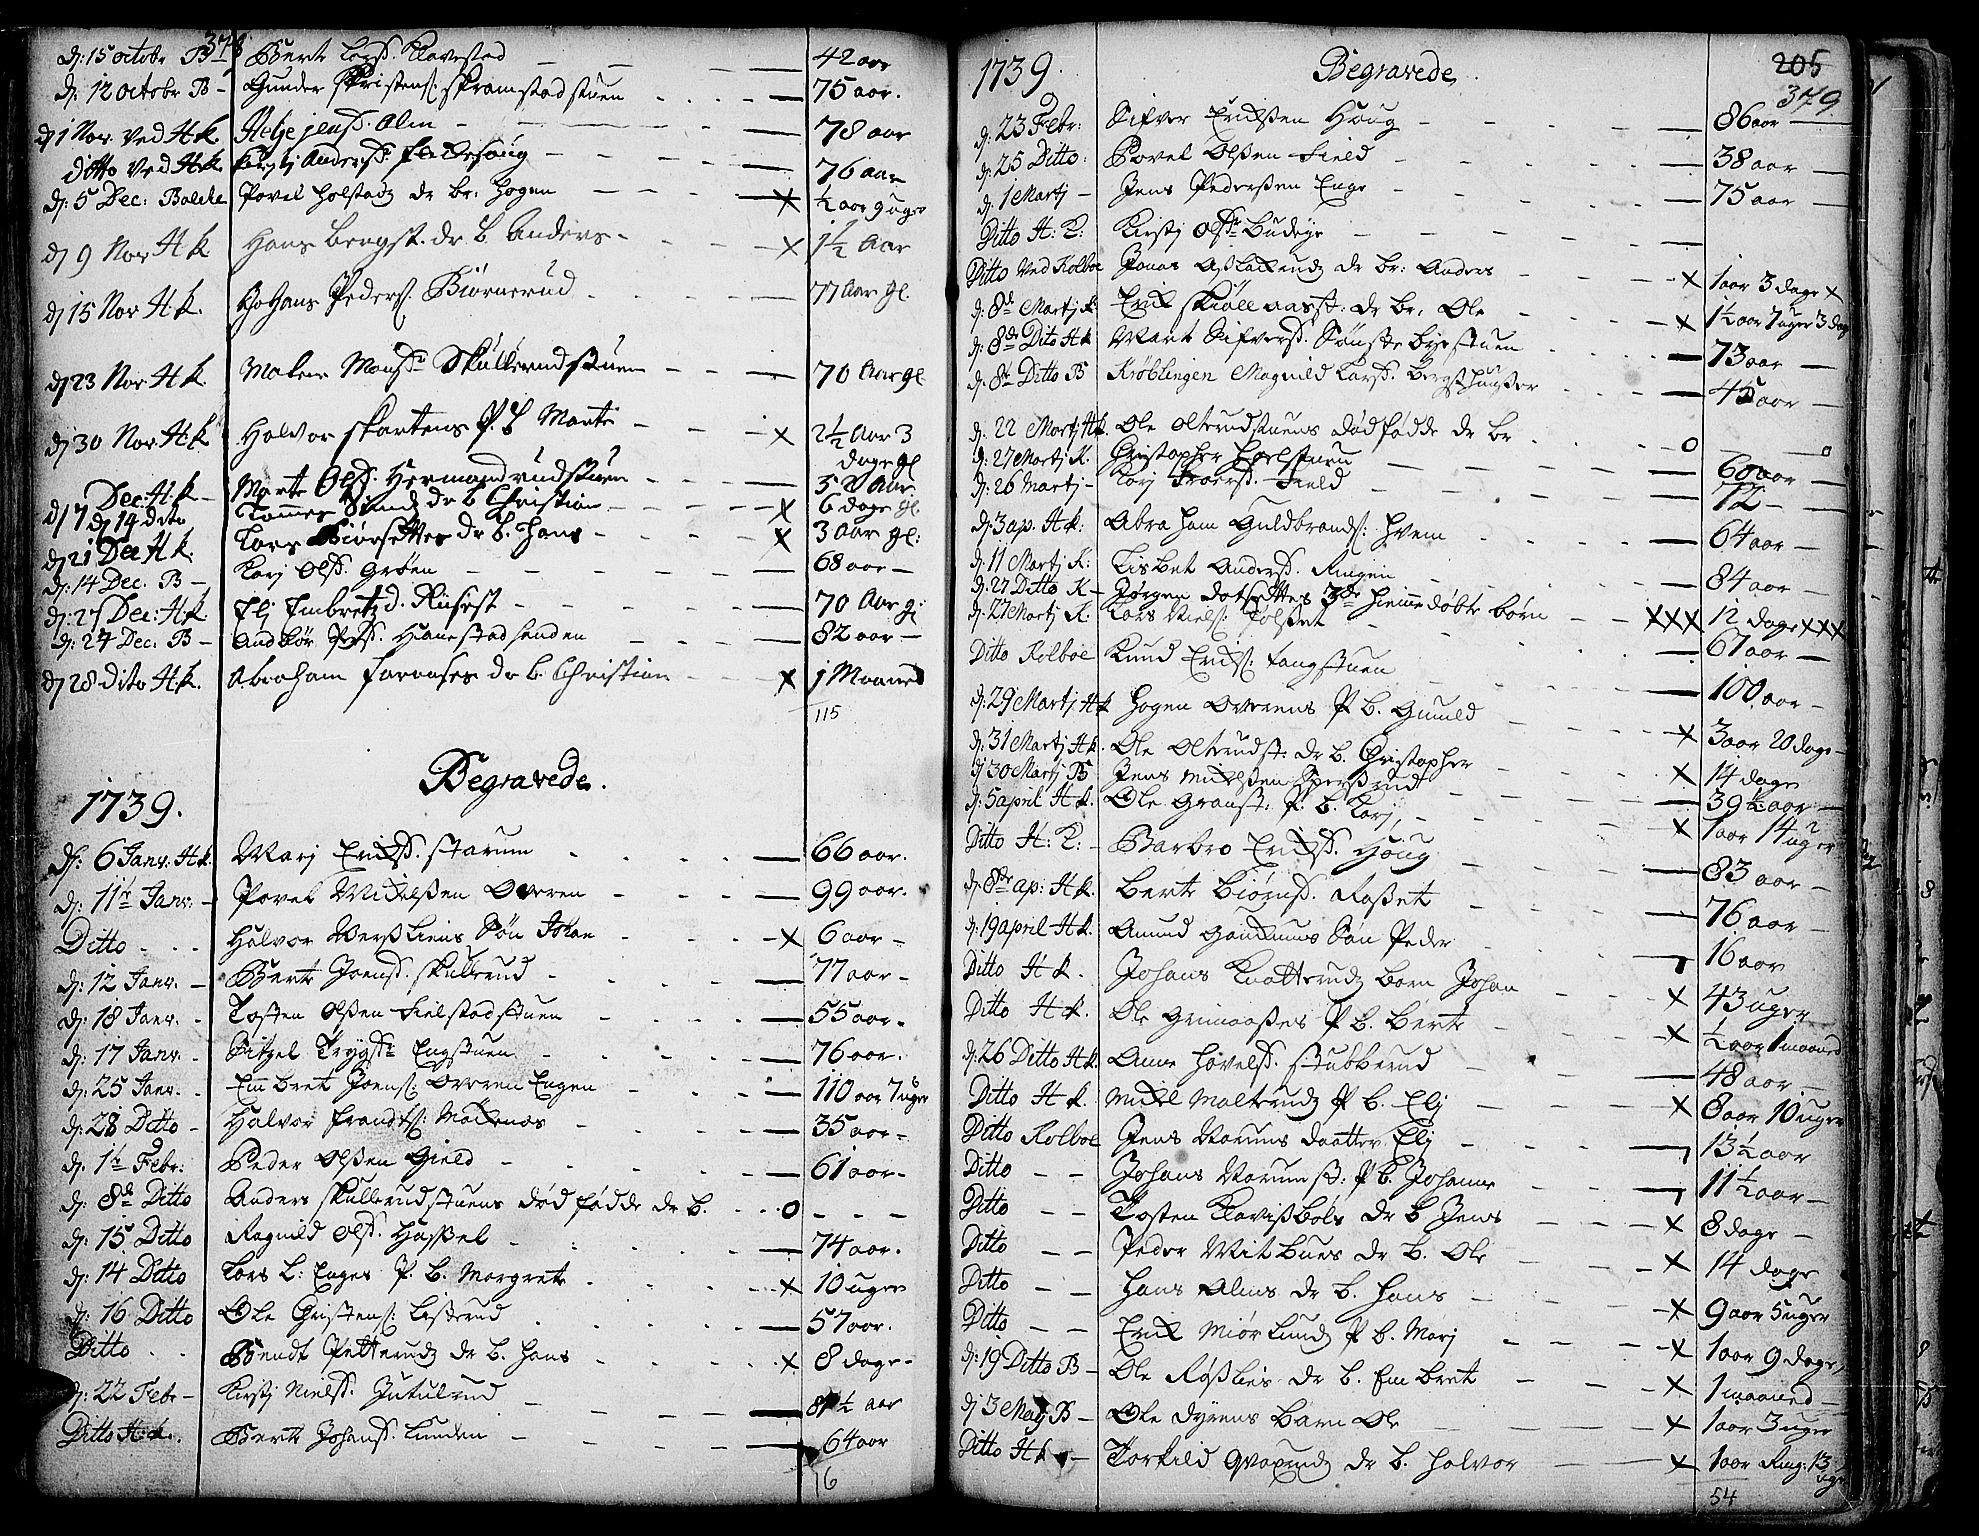 SAH, Toten prestekontor, Ministerialbok nr. 3, 1734-1751, s. 378-379